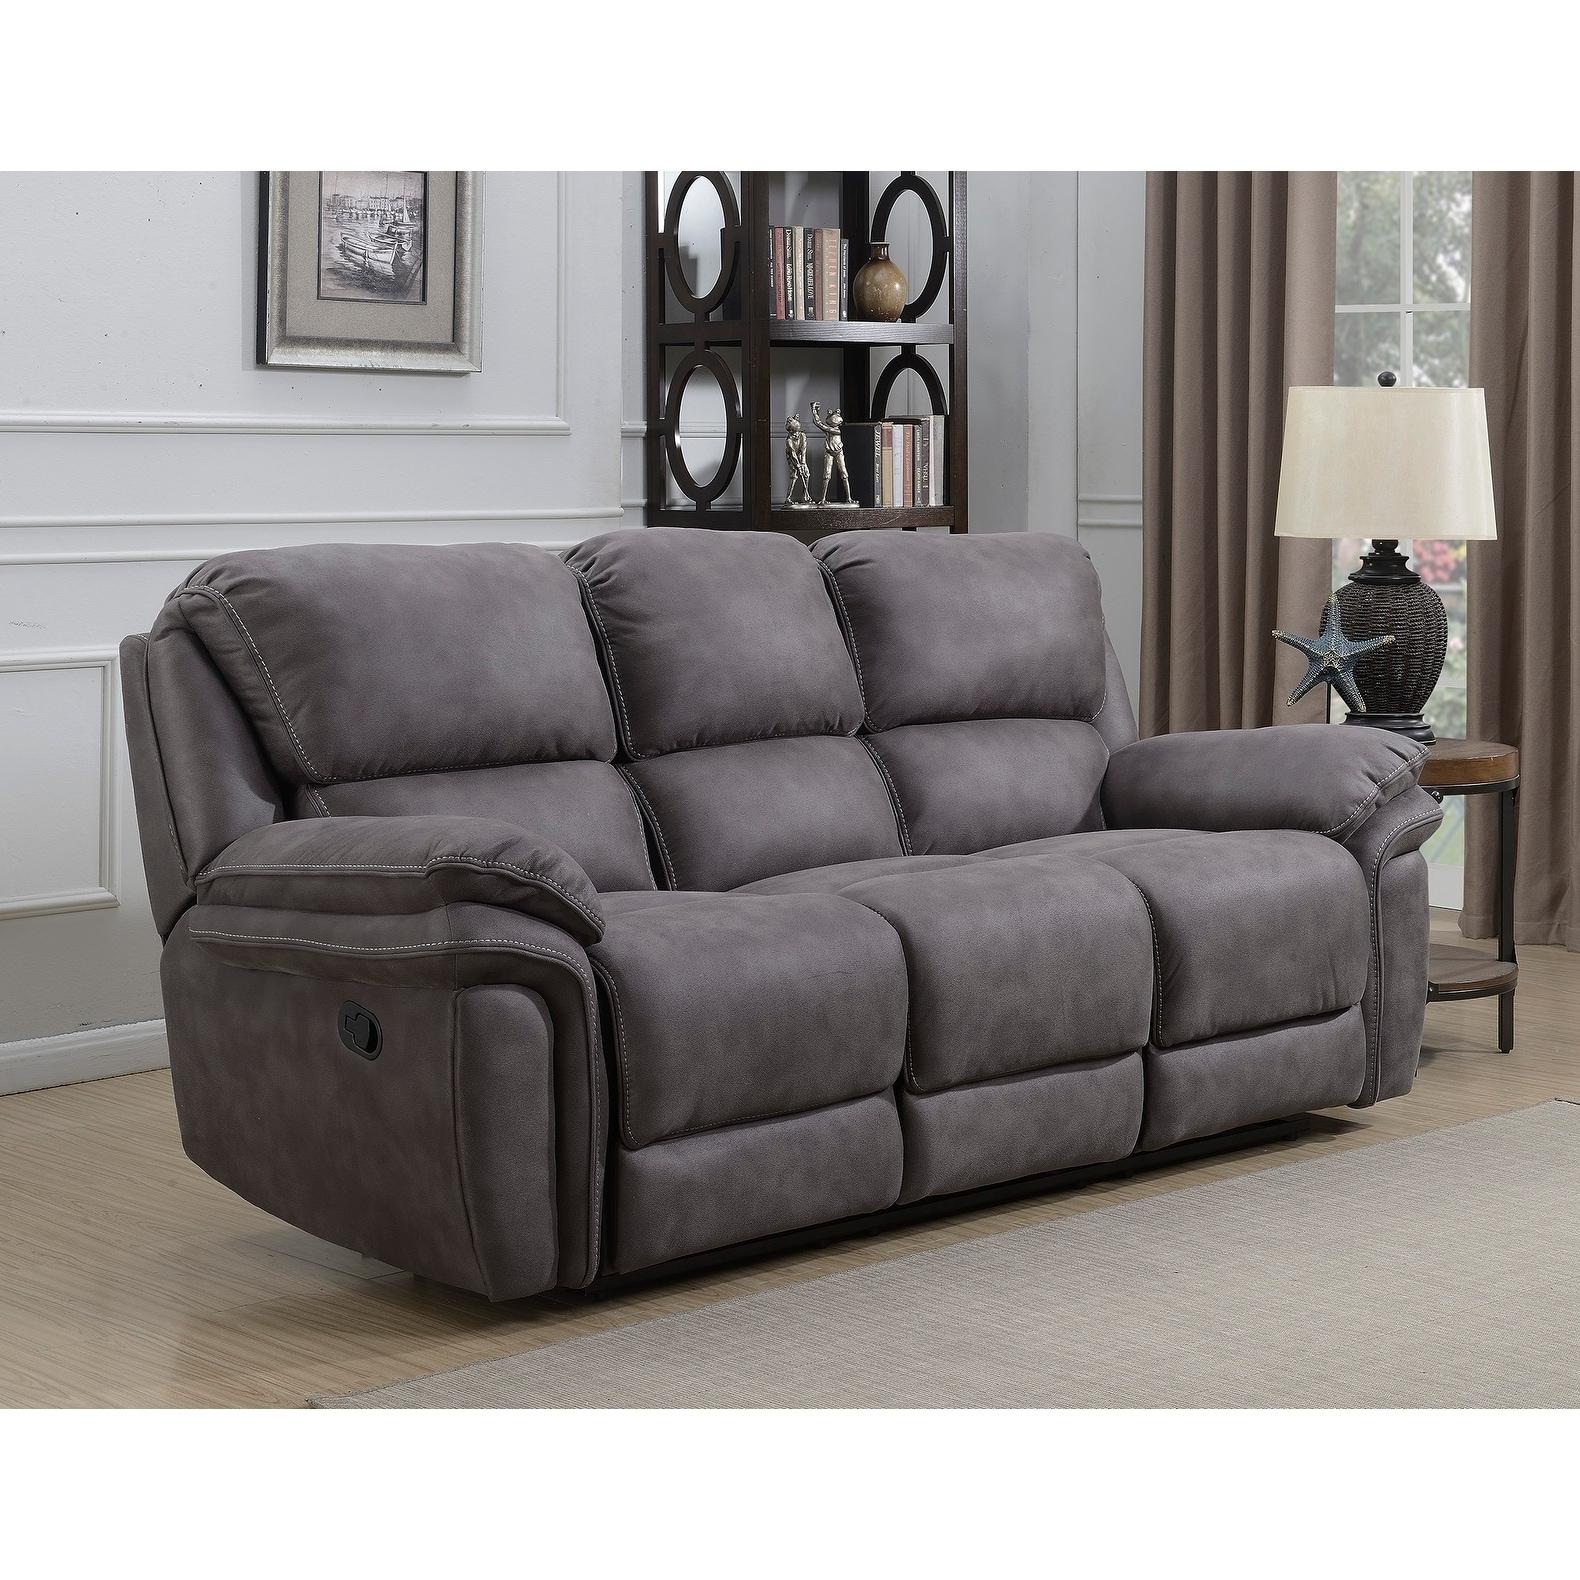 Shop Henry Dual Lay Flat Reclining Sofa with Memory Foam Seat ...